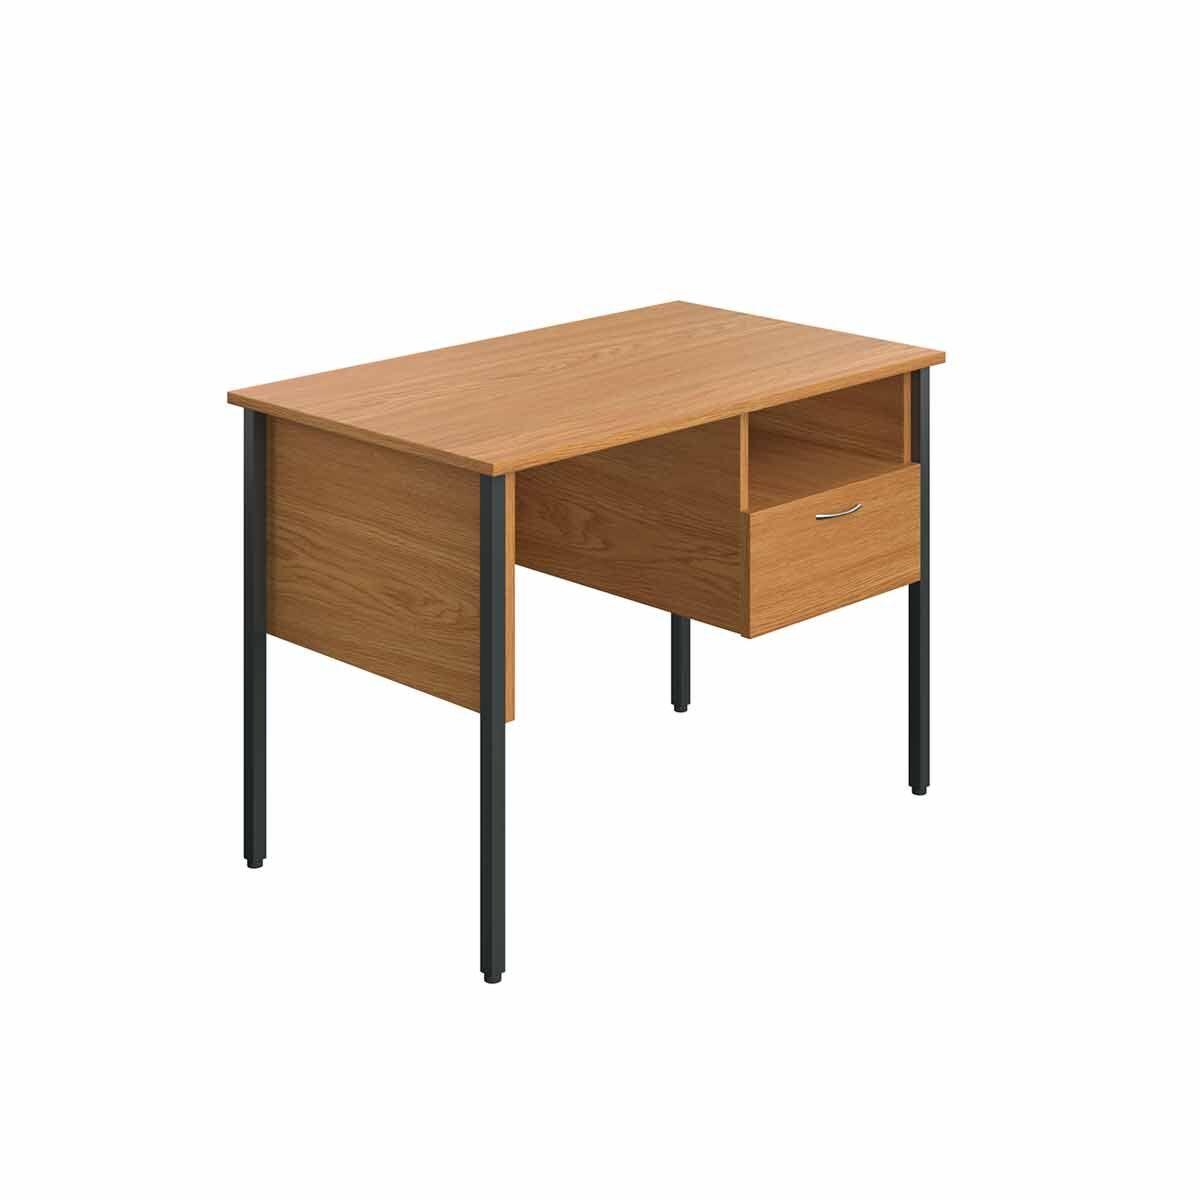 TC Office Eco 4 Leg Homework Desk with Drawer 100cm Oak